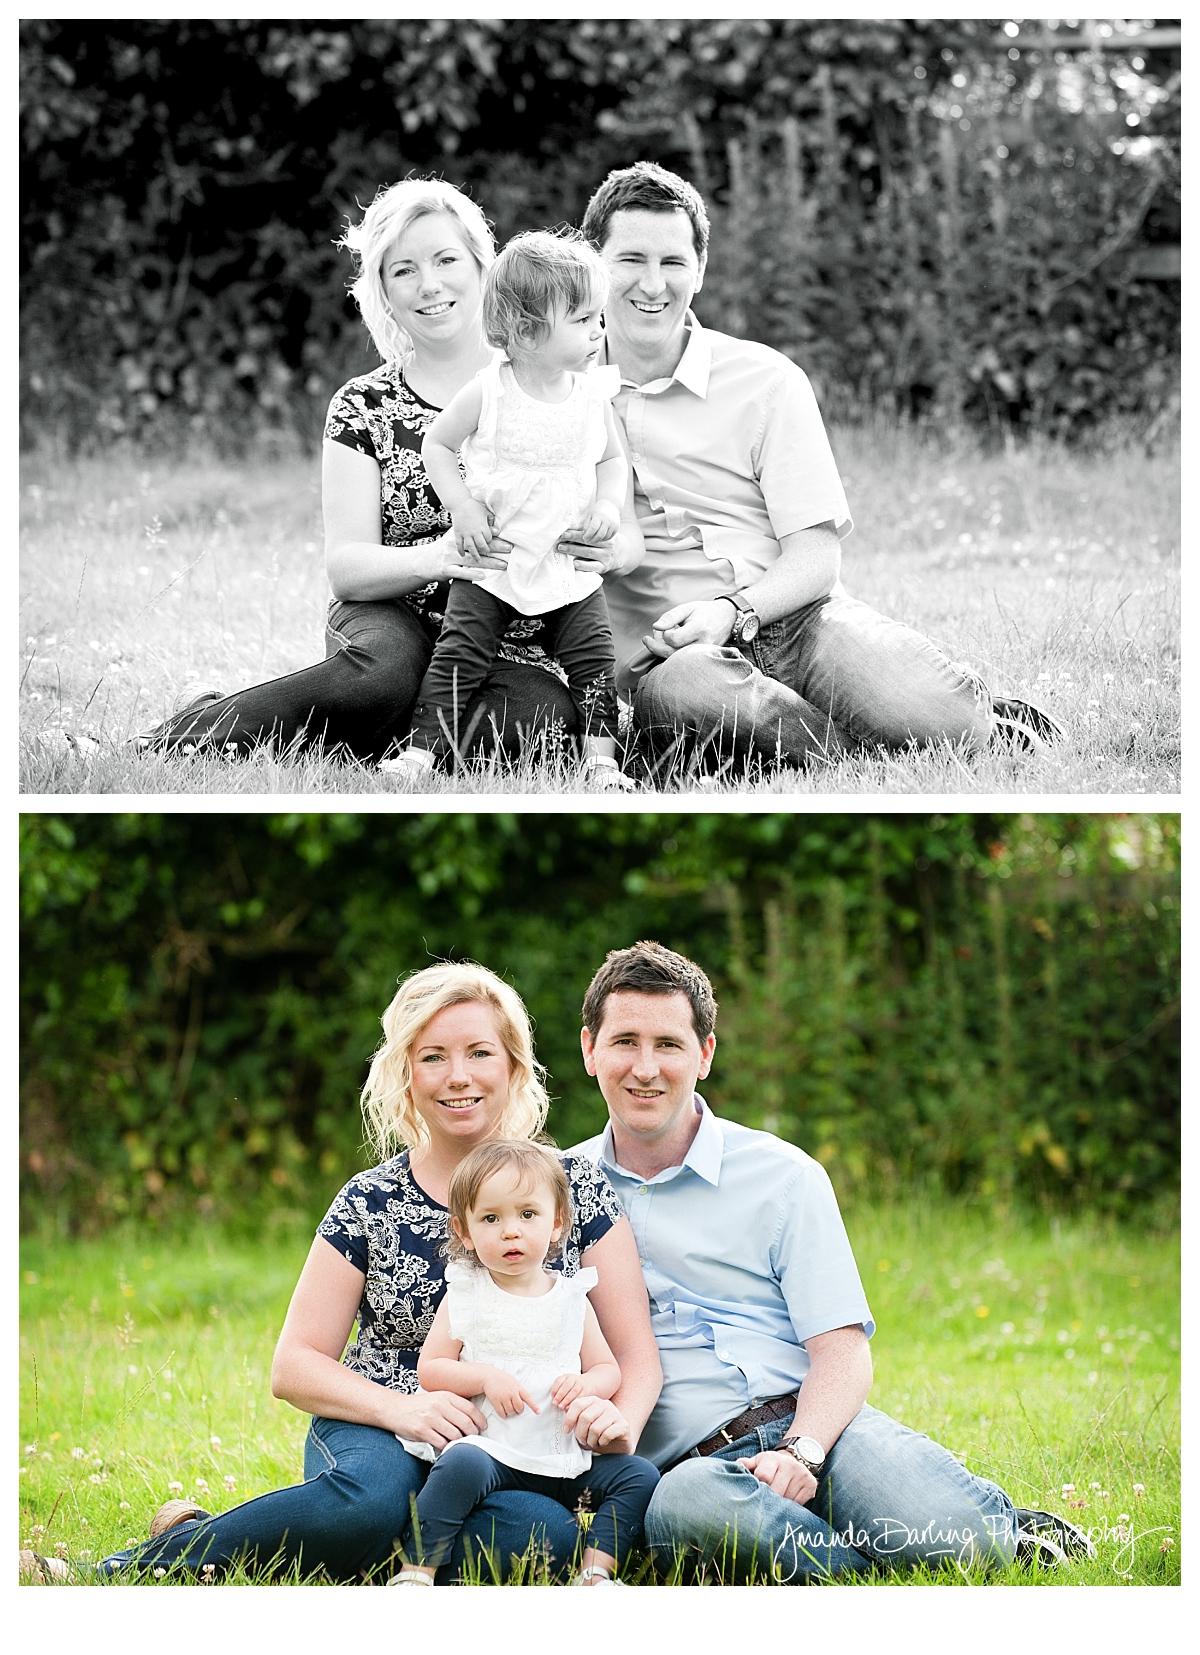 Surrey-Family-Photoraphy-amanda-Darling